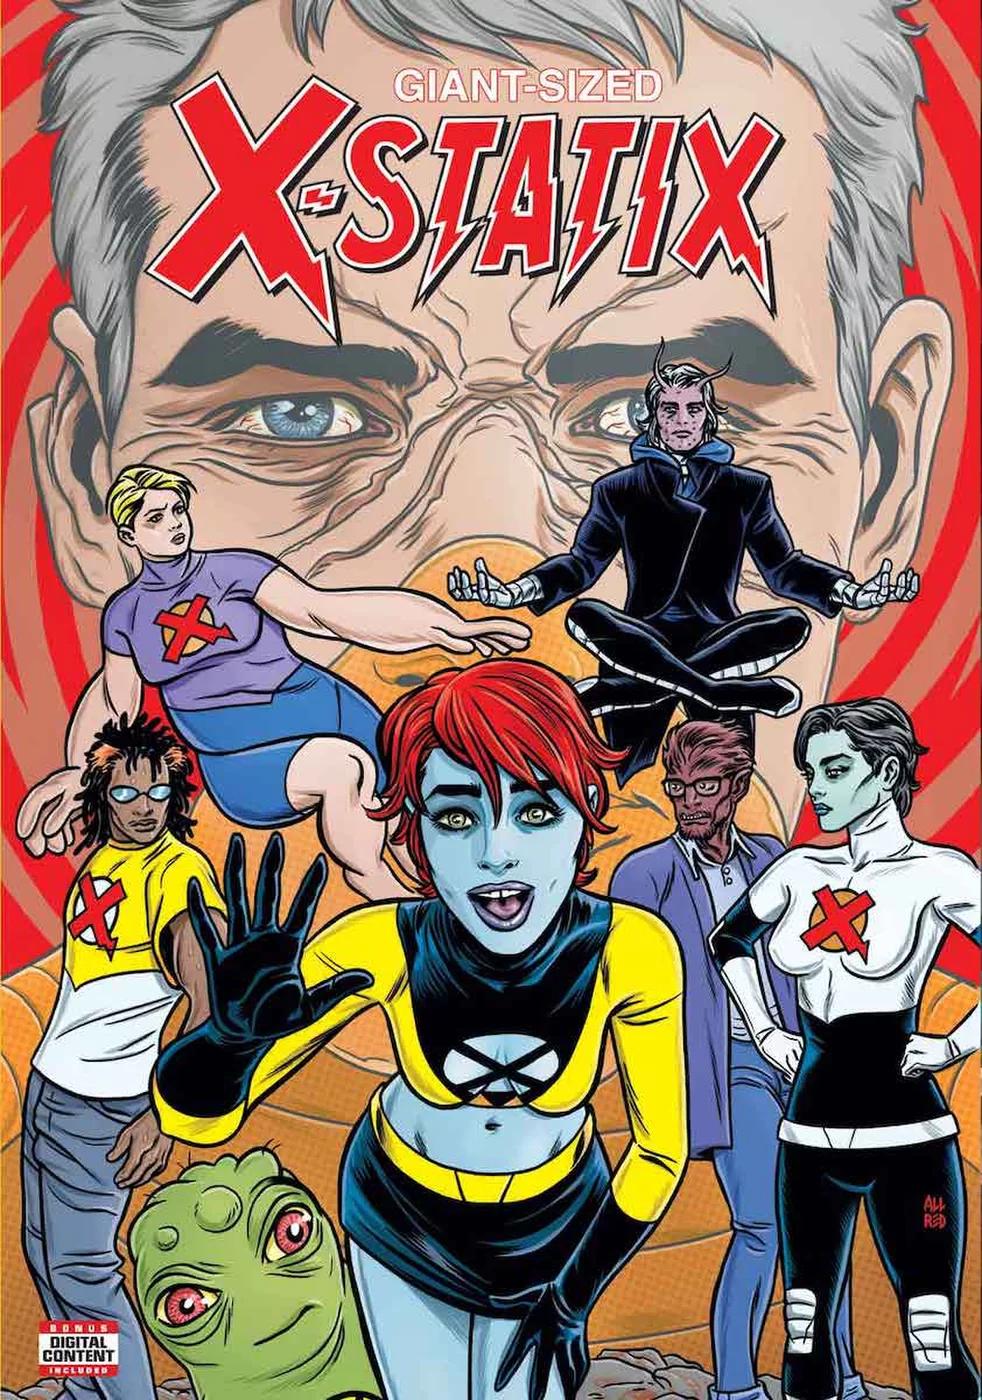 Giant-Sized X-Statix #1, copertina di Mike Allred